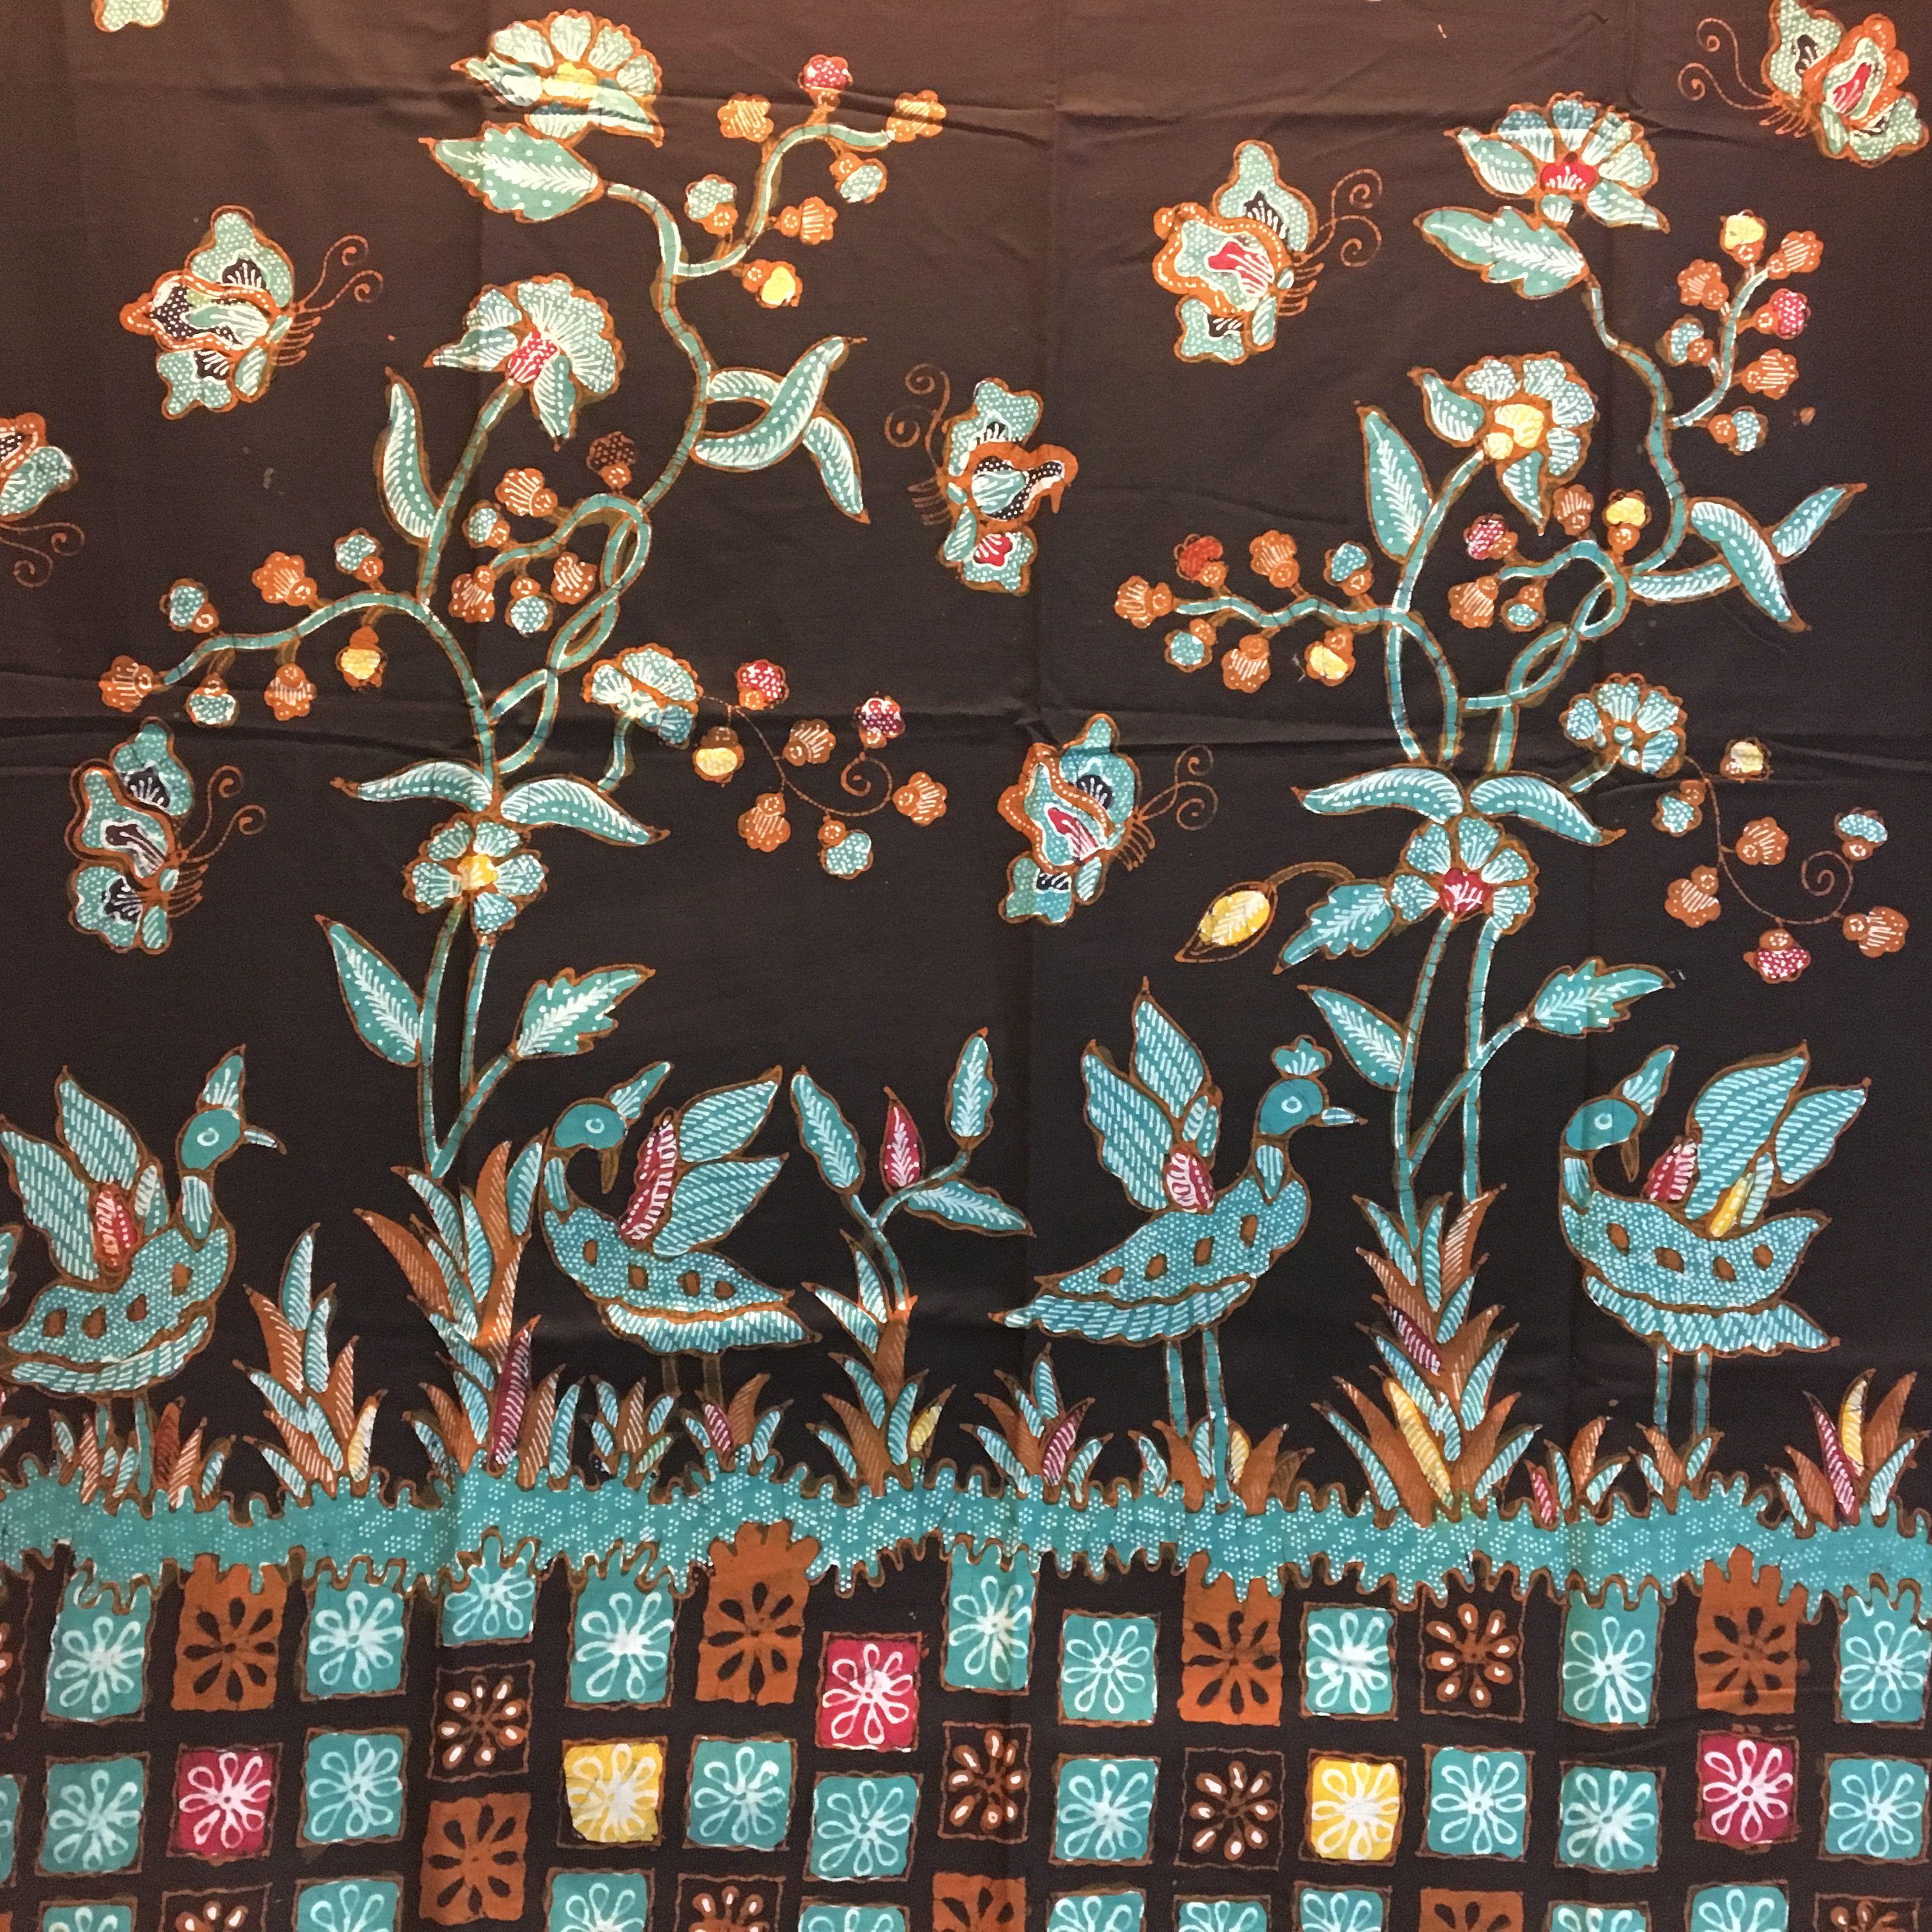 4 Penemu Batik Tulis: Kain Batik Tulis Madura BTMA-150-3 #Batik #Kainbatik